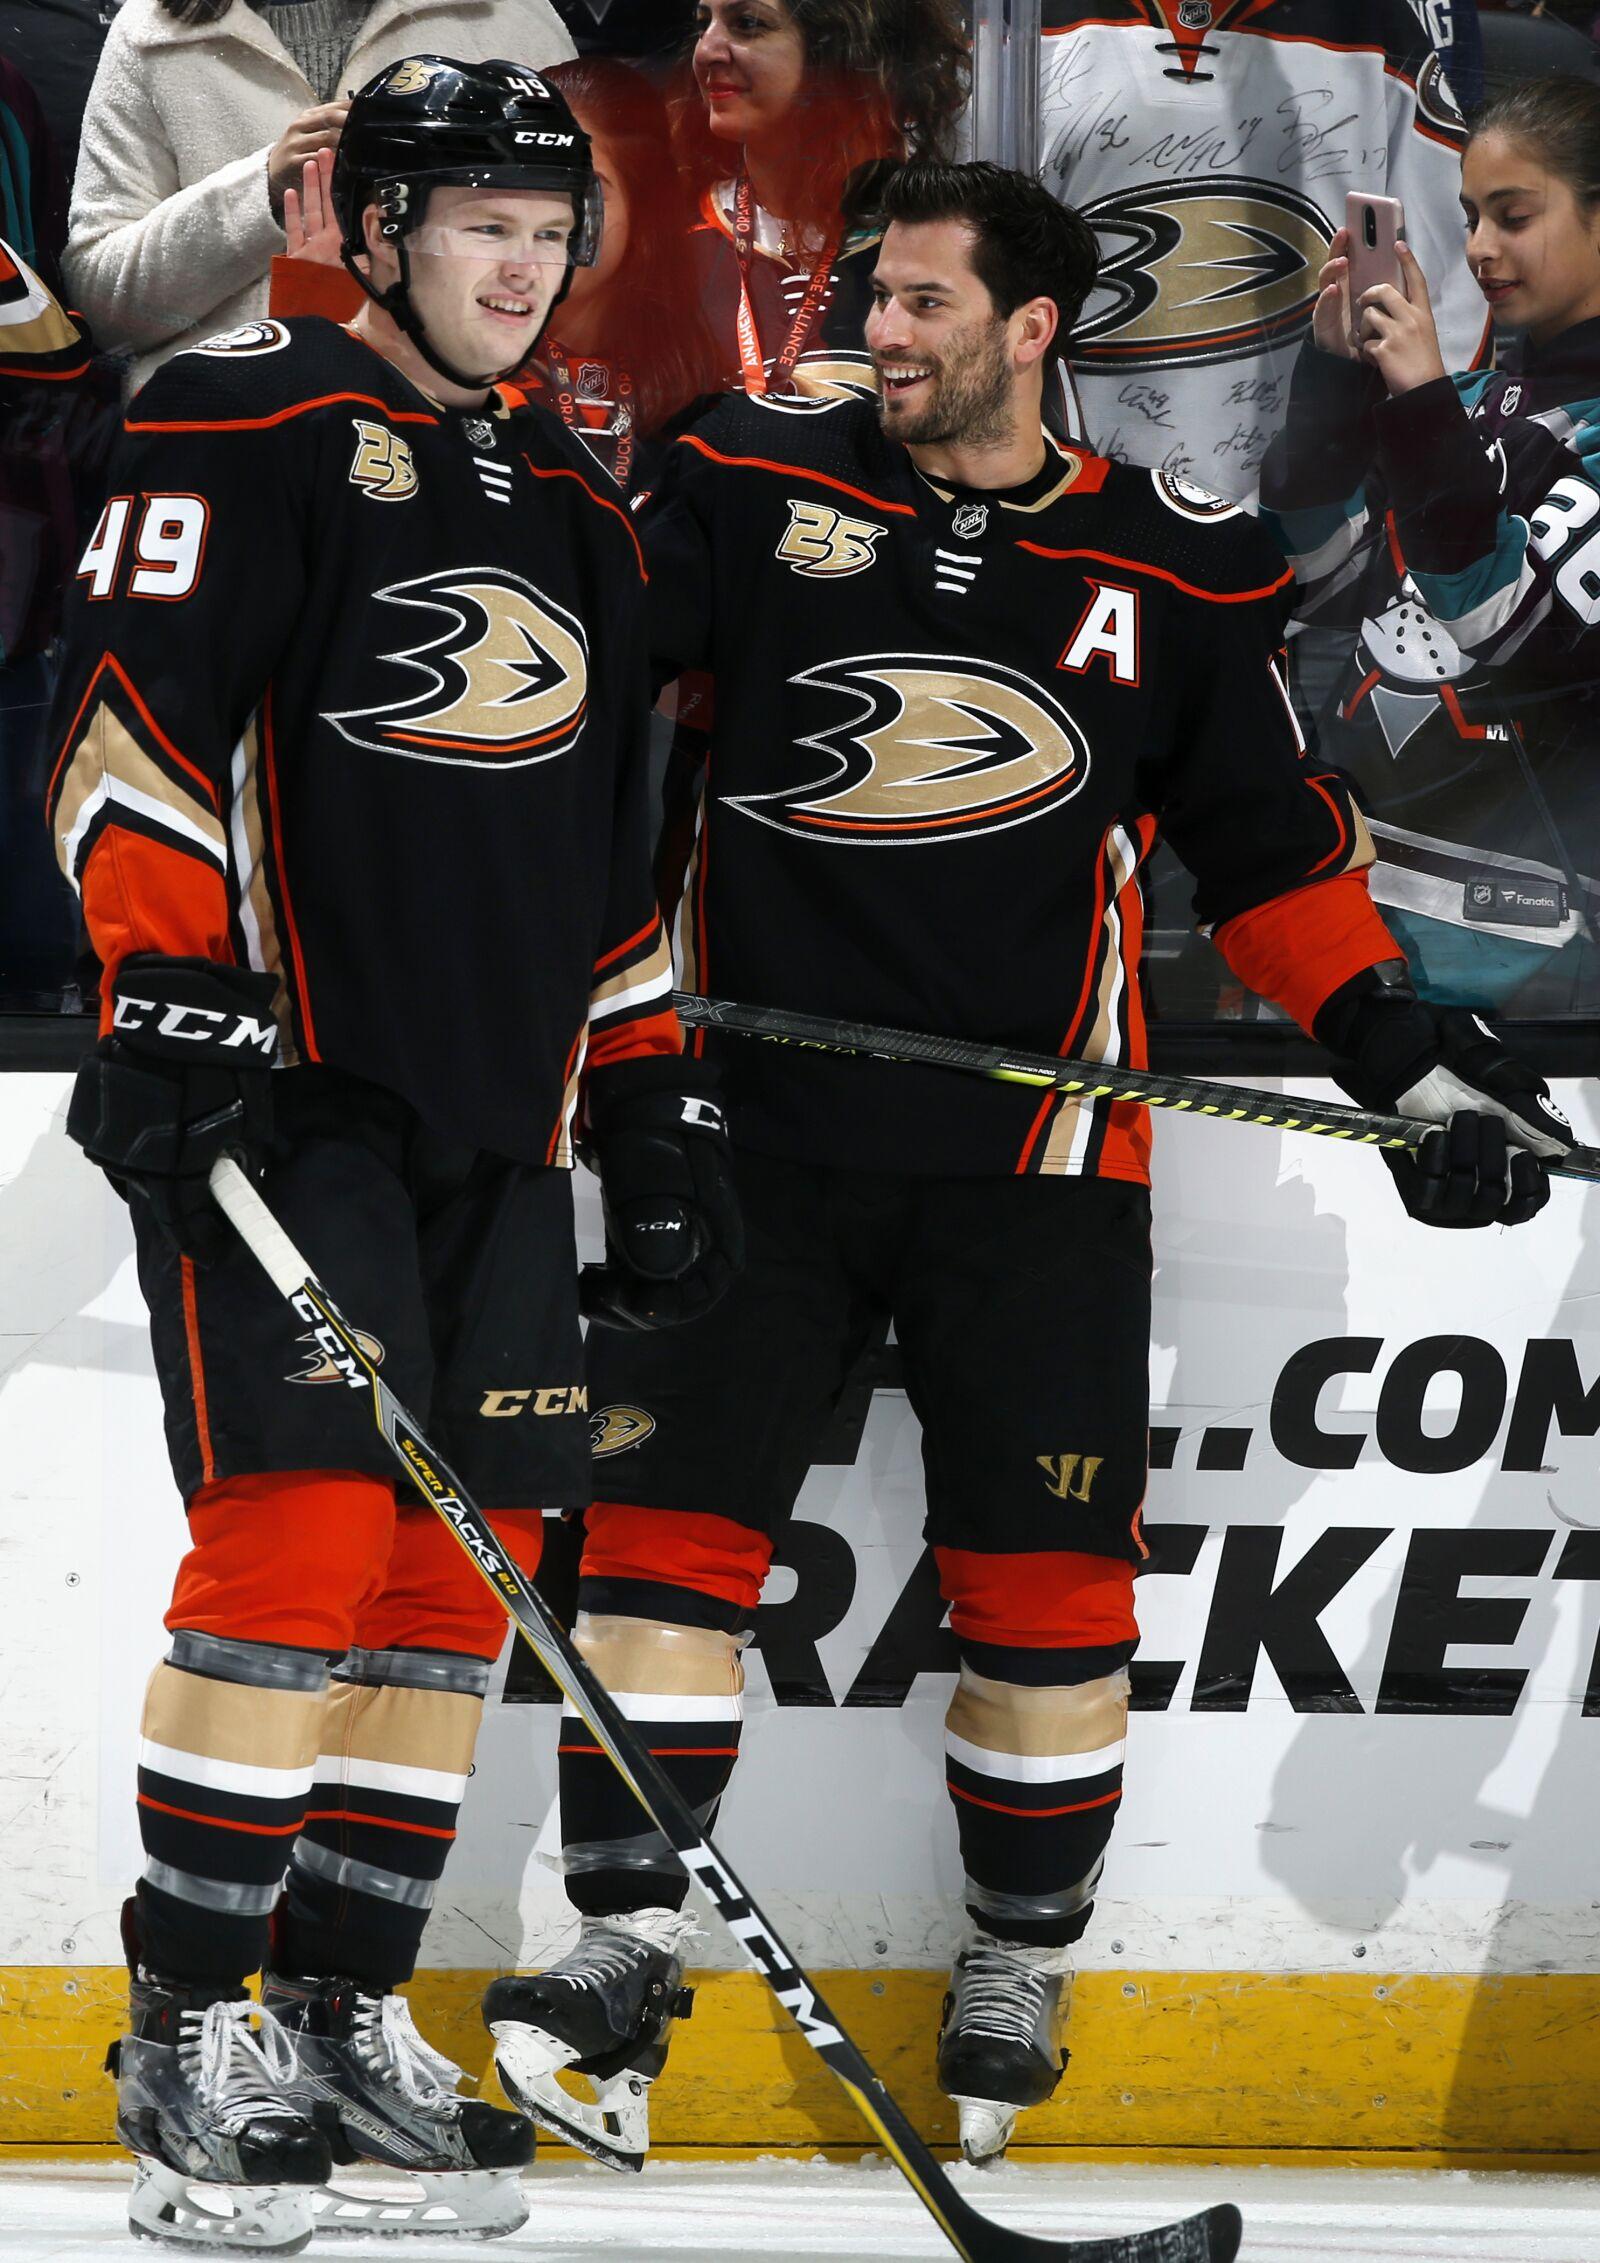 The Anaheim Ducks Eventually Made A Good Impression In Preseason Game One